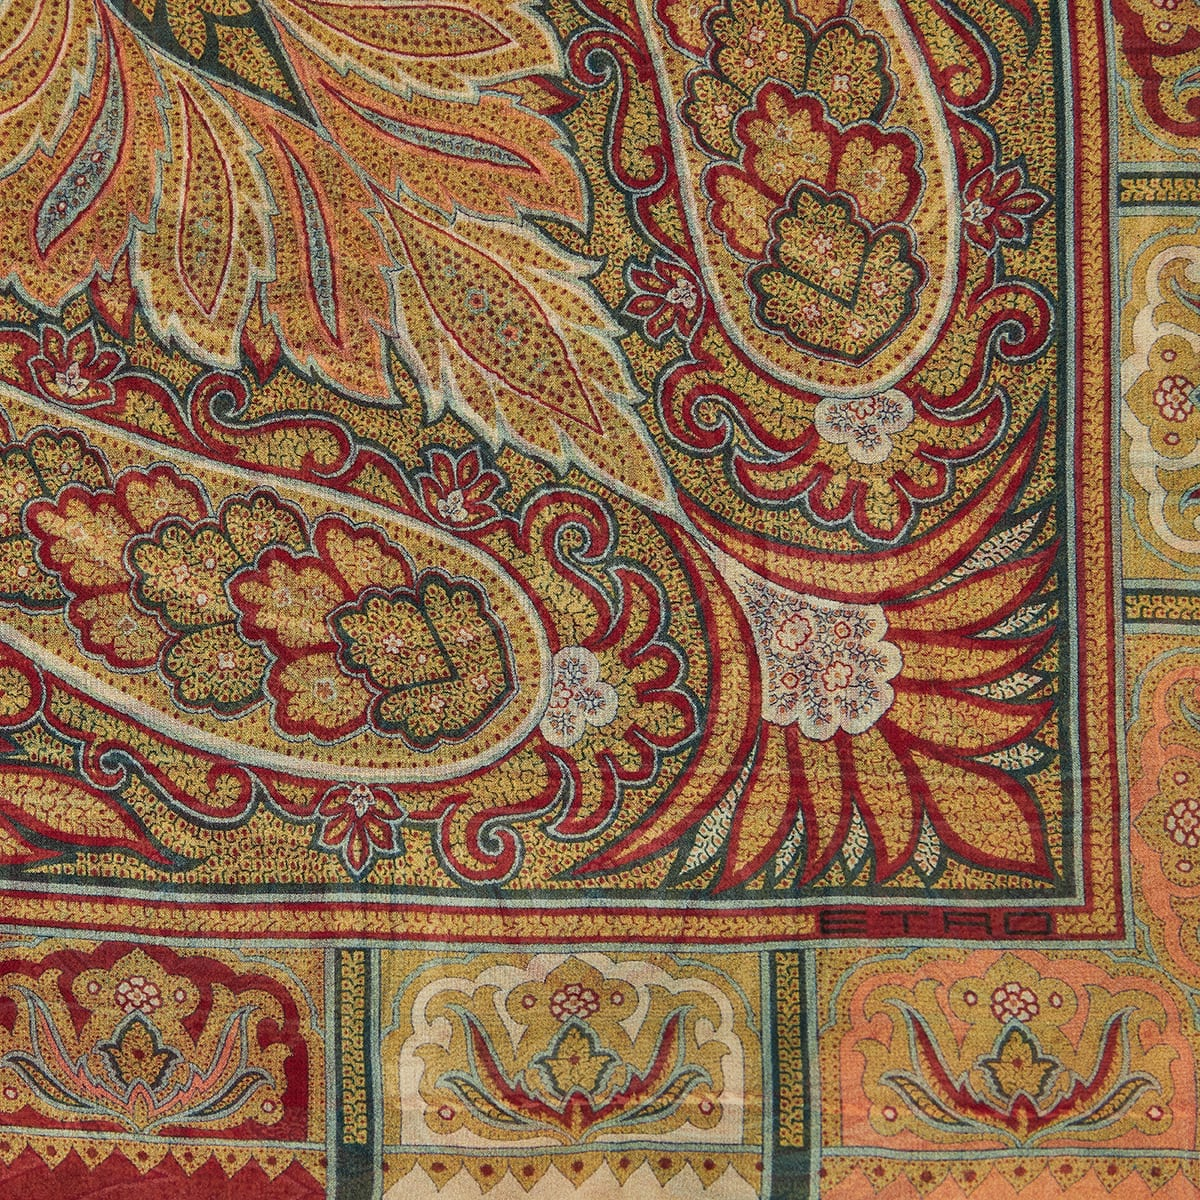 Paisley print silk shawl